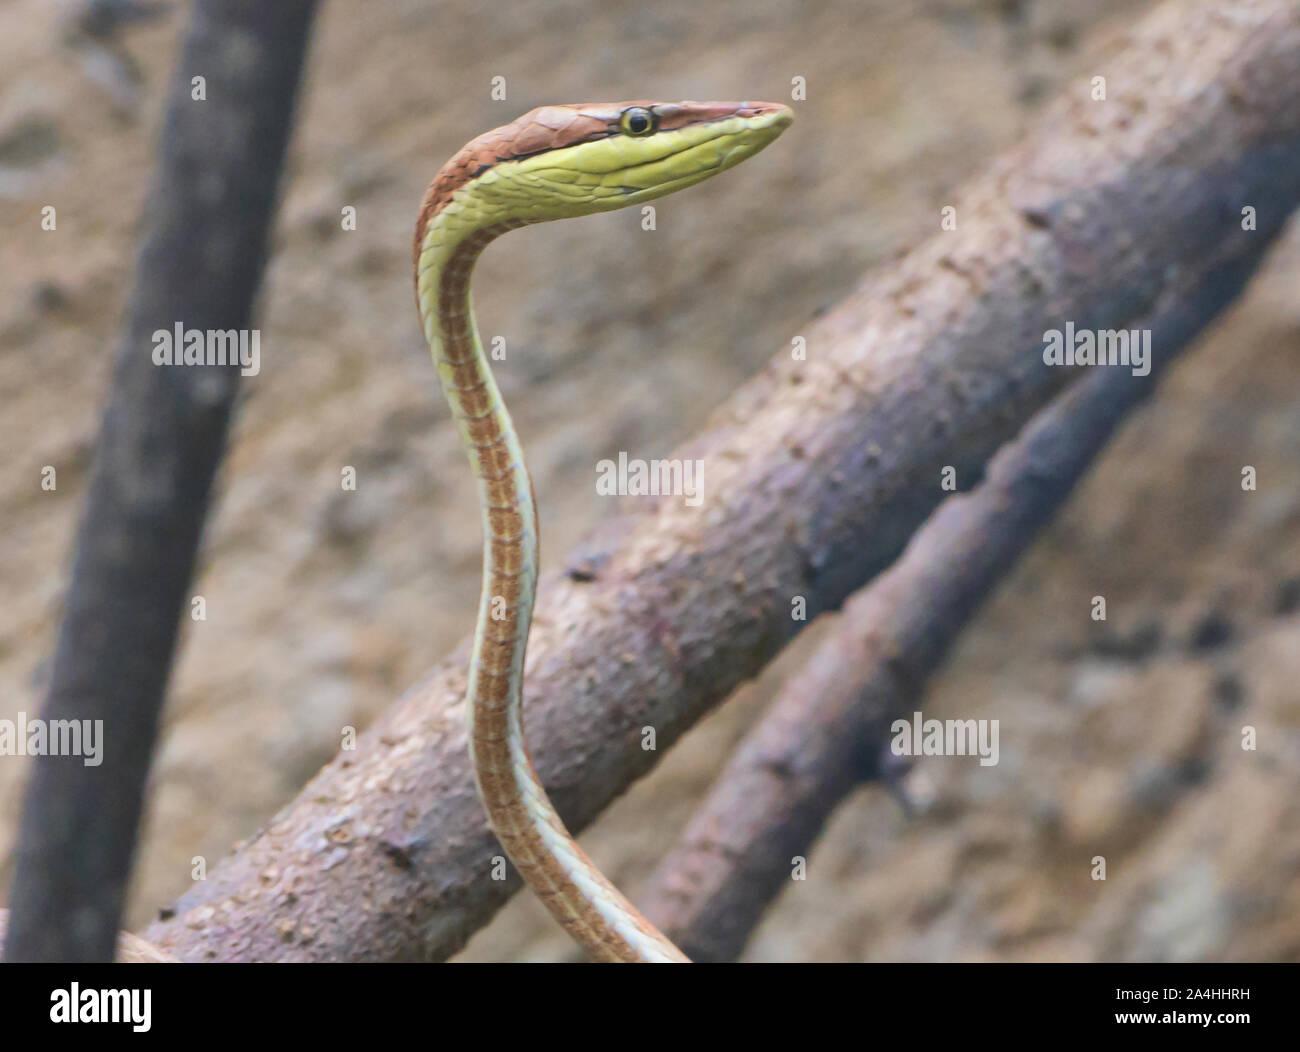 Cope's vine snake (oxybelis brevirostris), Ecuador Stock Photo